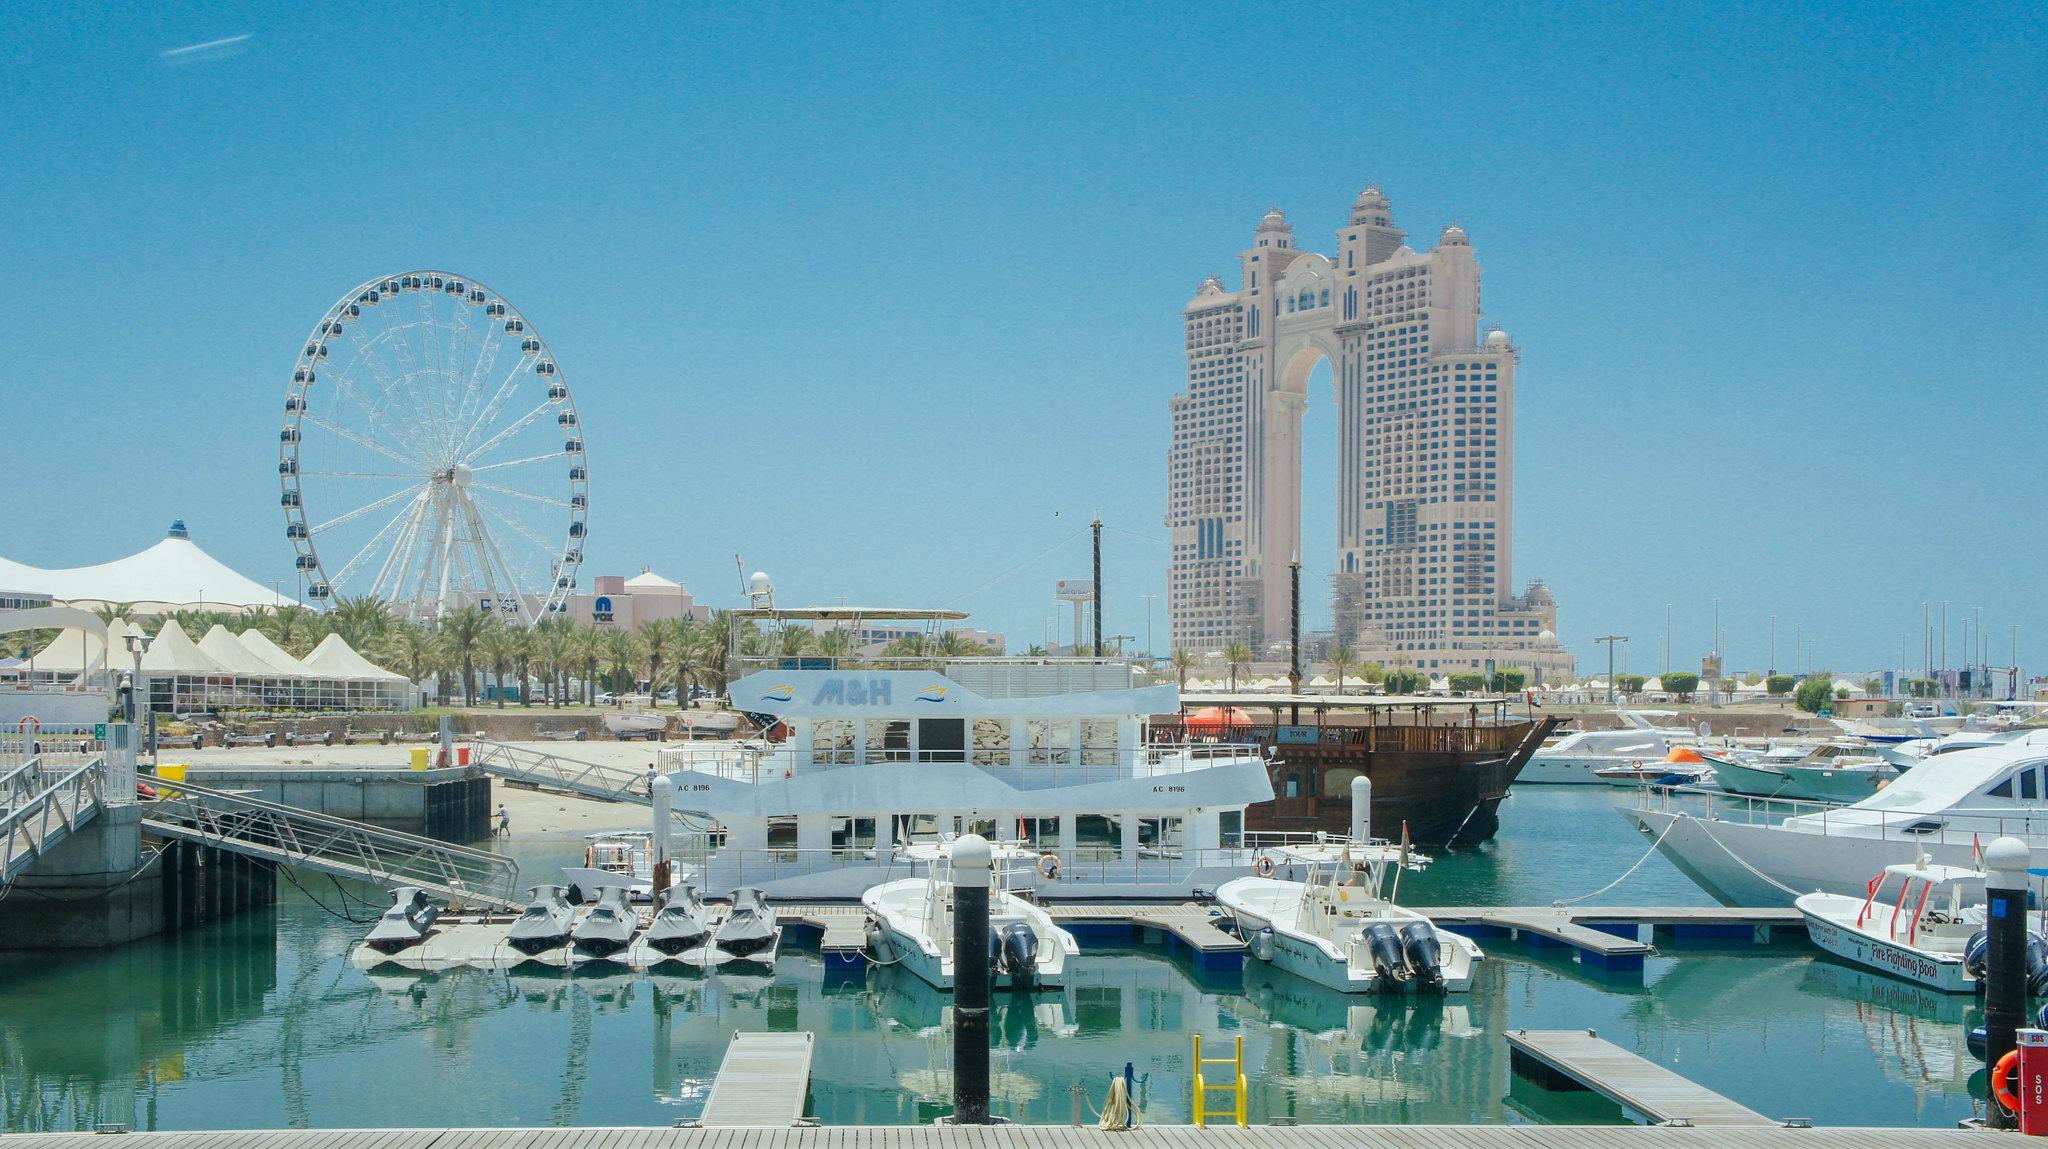 View of Abu Dhabi marina